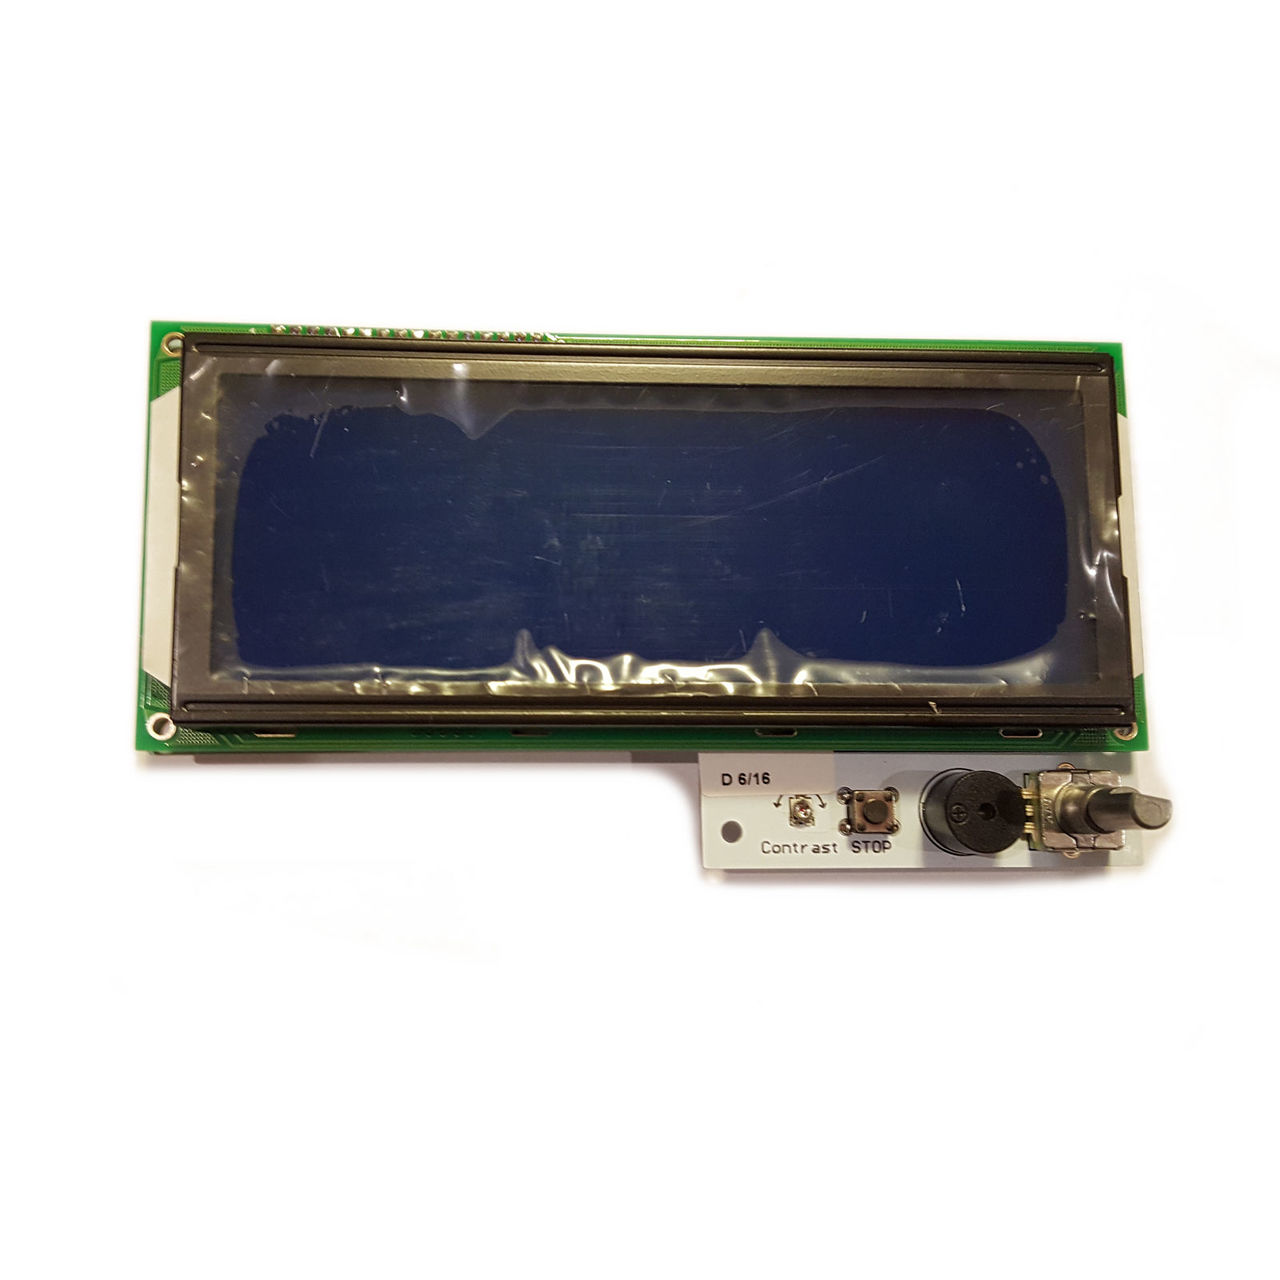 Smart LCD Controller XXL - Reprapdiscount